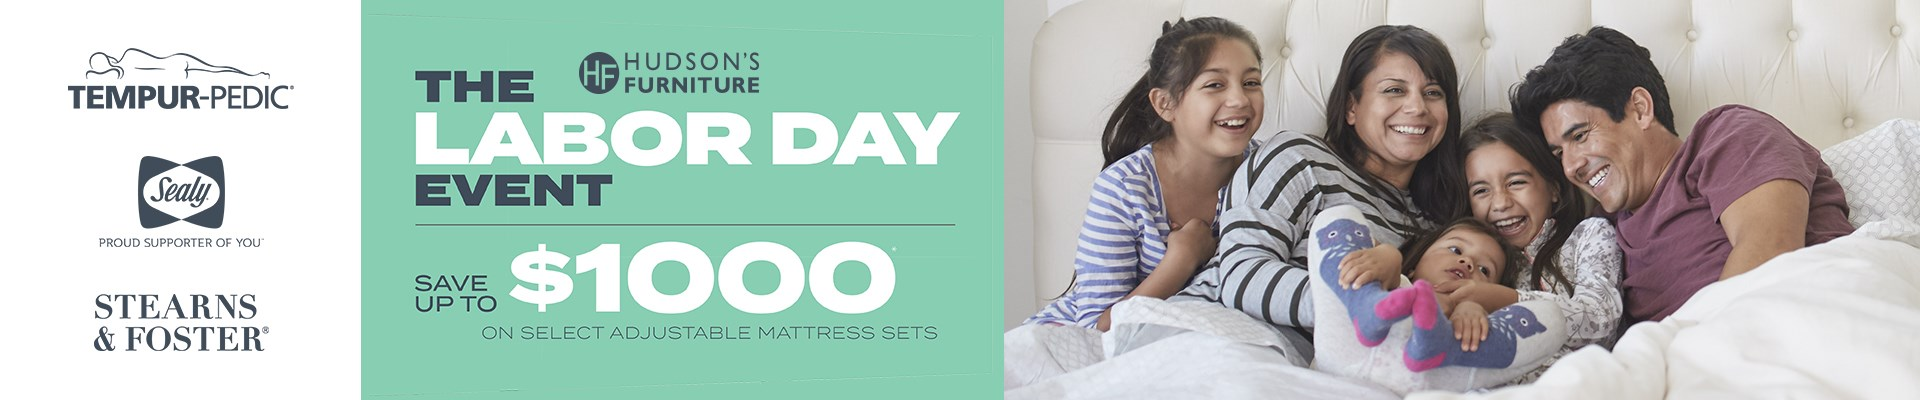 Tempur-Pedic® Labor Day Mattress Sale - Going On Now!